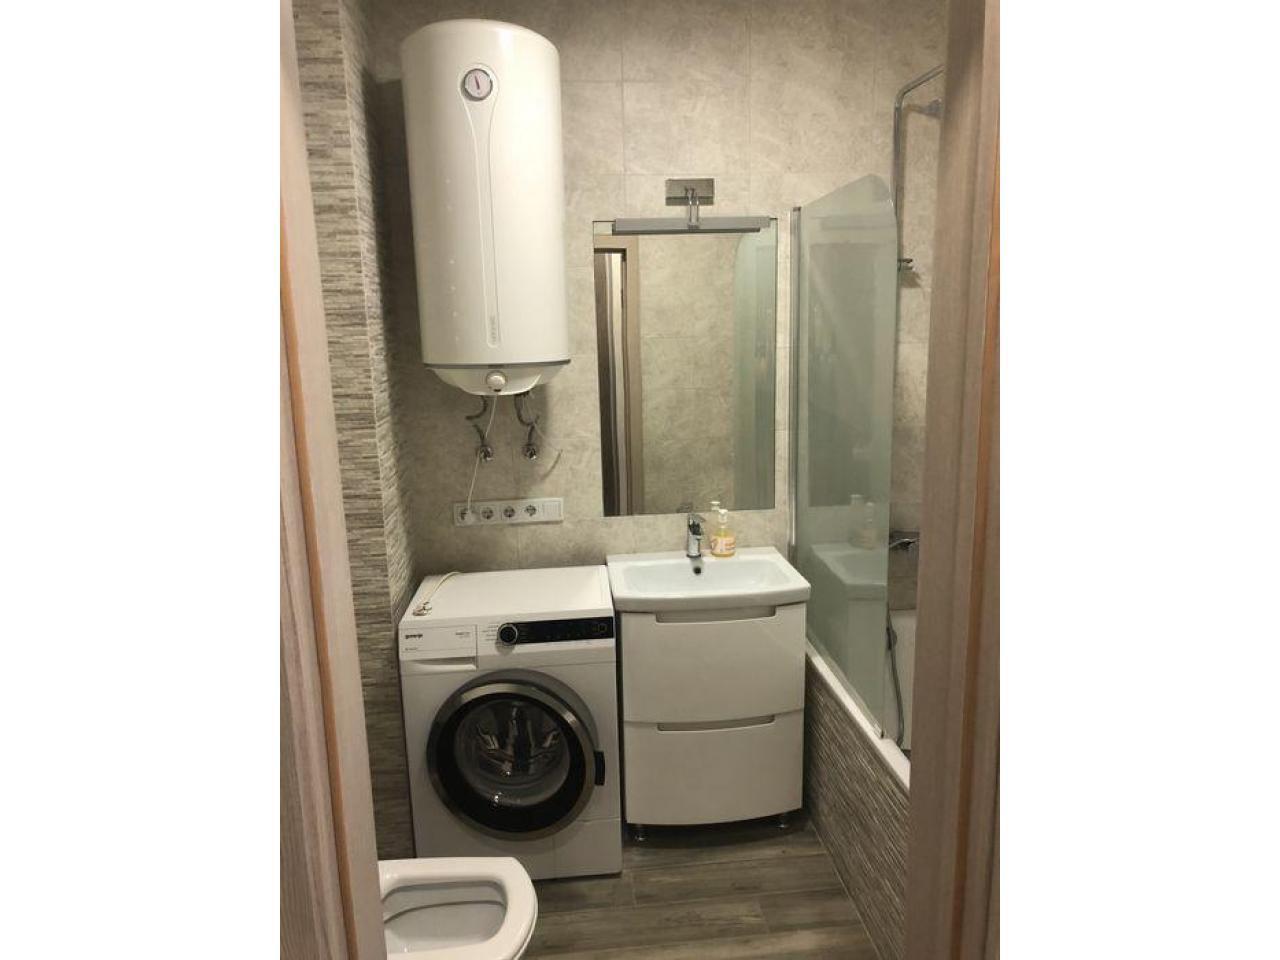 сдам однокомнатную квартиру недорого срочно Plaistow E13. - 6